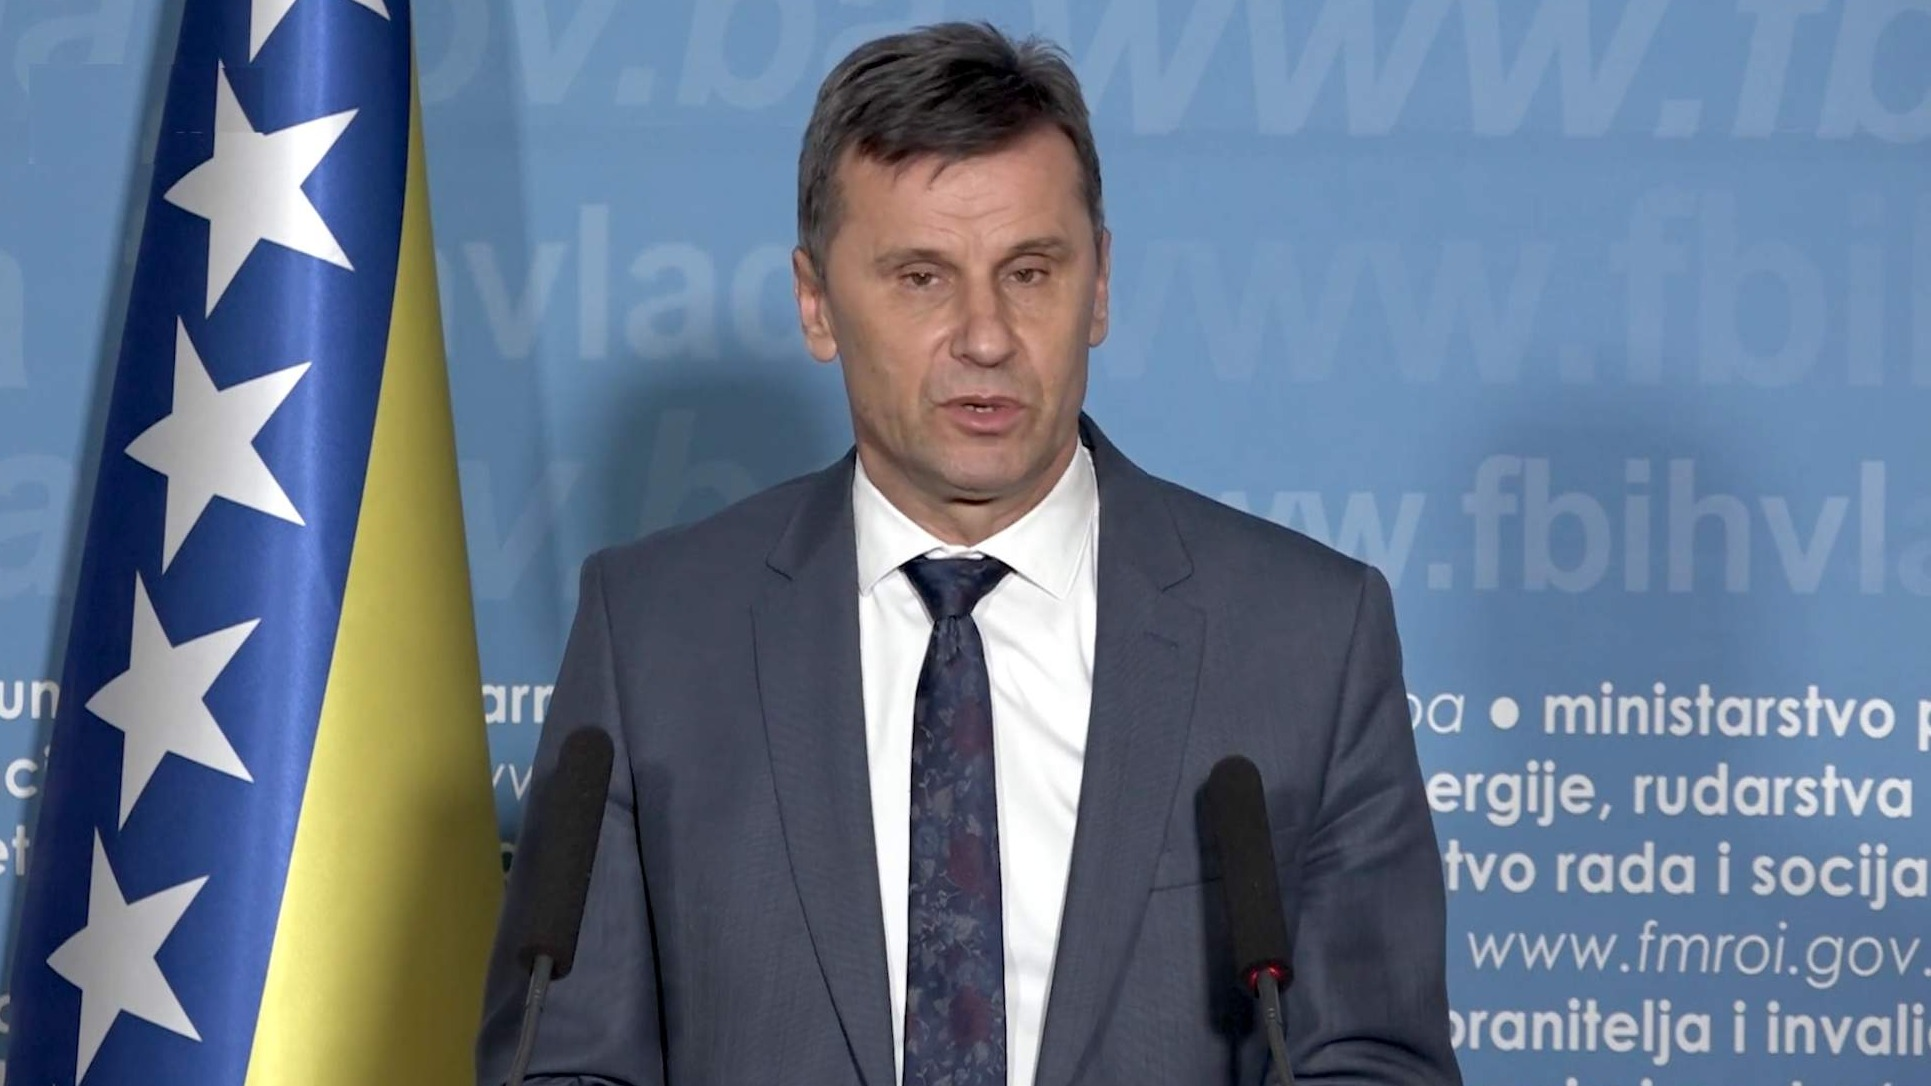 Fadil Novalić: Vlada FBiH usvojila zakon o ublažavanju negativnih  ekonomskih posljedica | Preporod.info